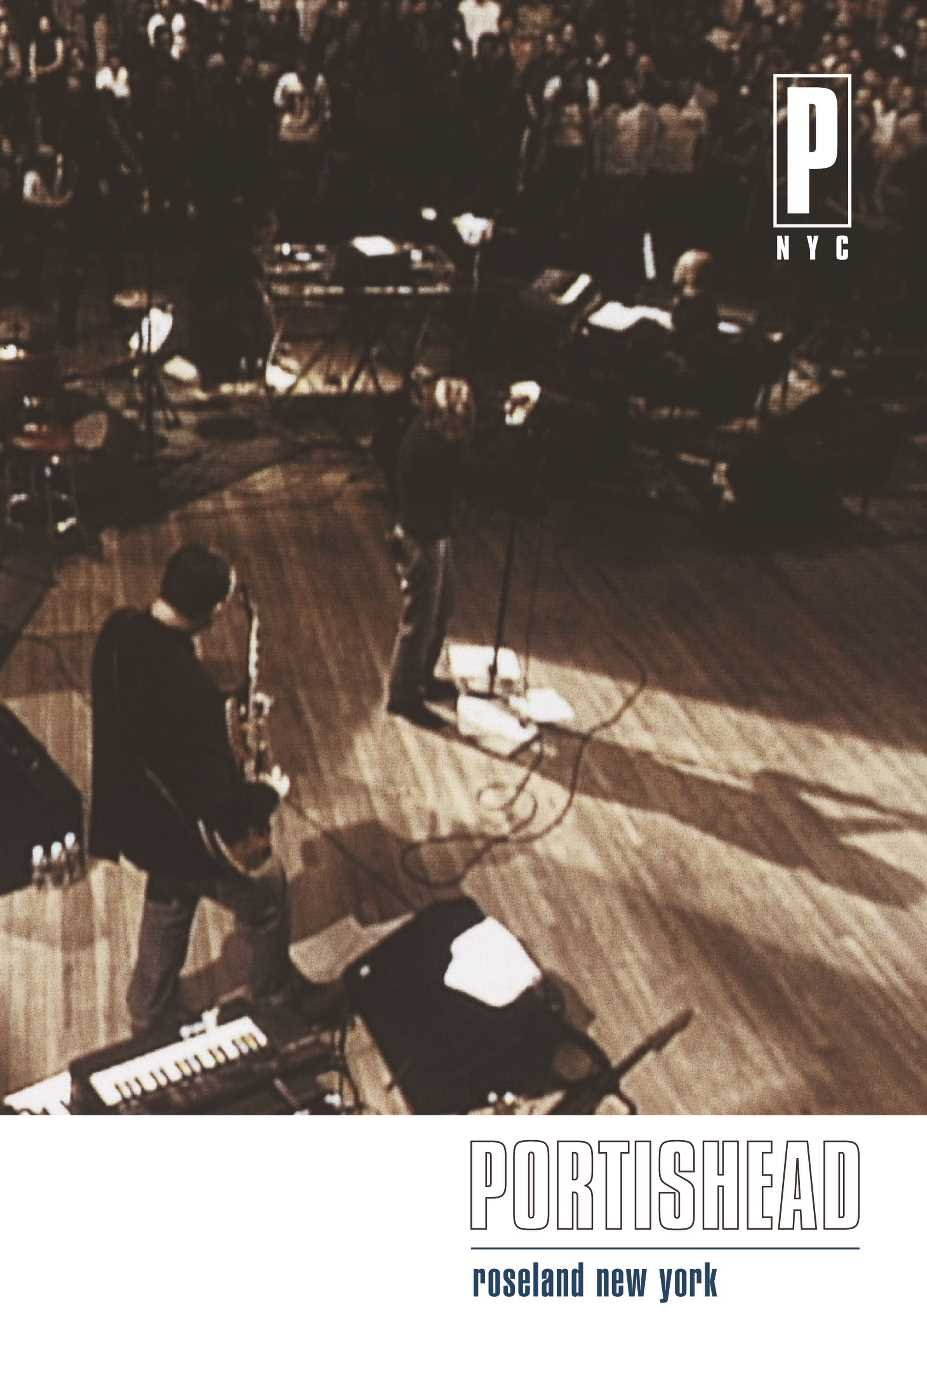 Live: Portishead by Universal Music & VI